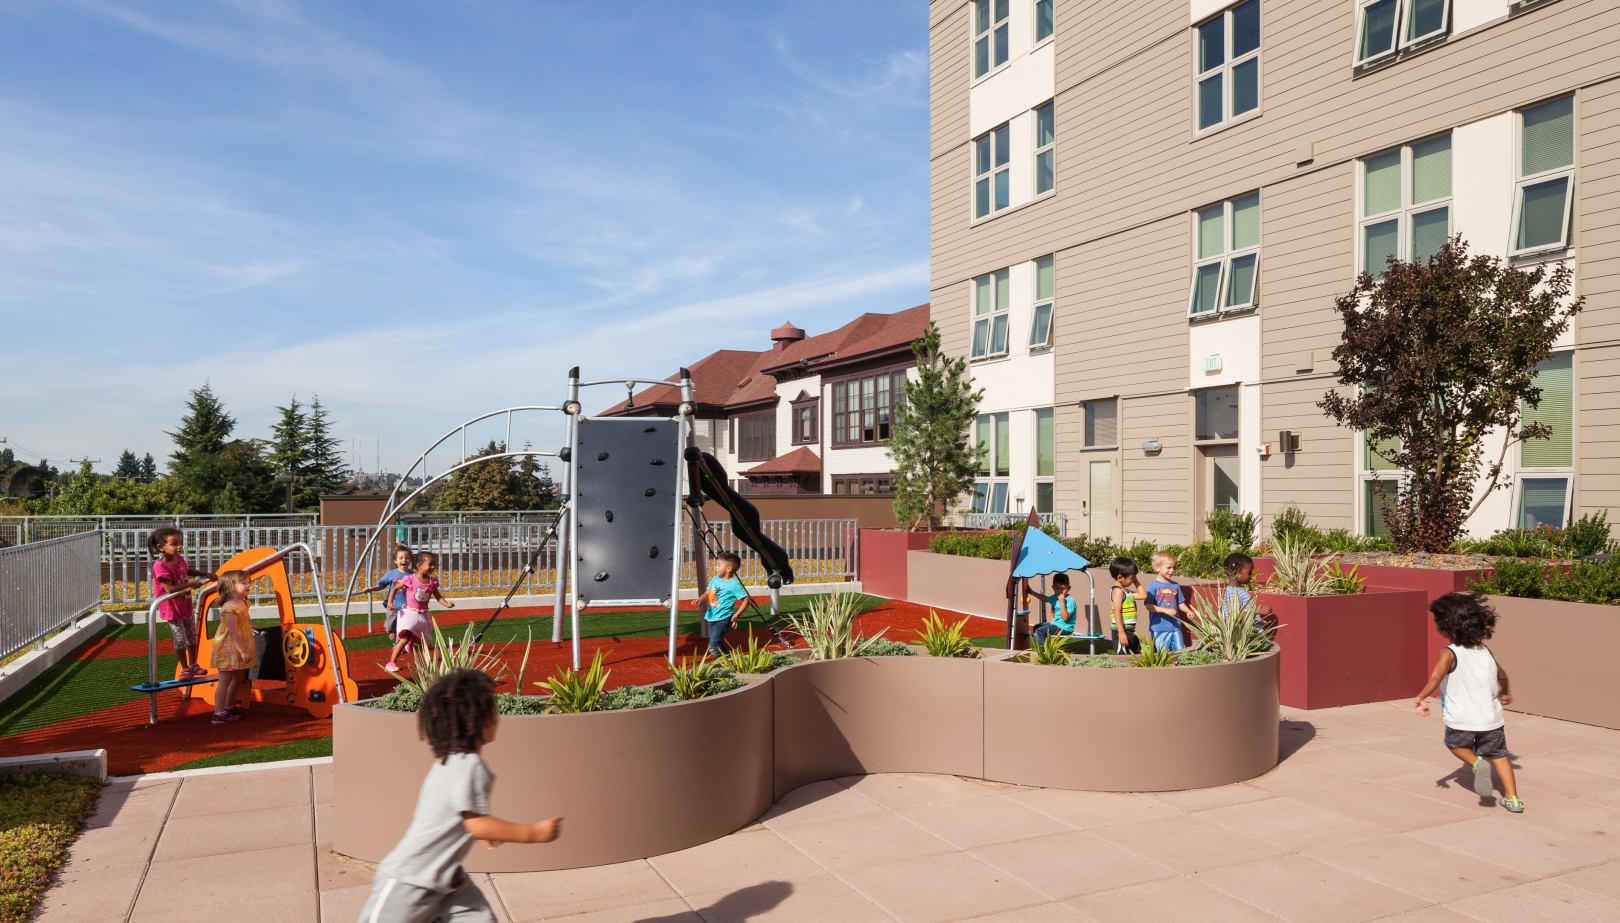 AIA/HUD Awards - Plaza Roberto Maestas, Beloved Community